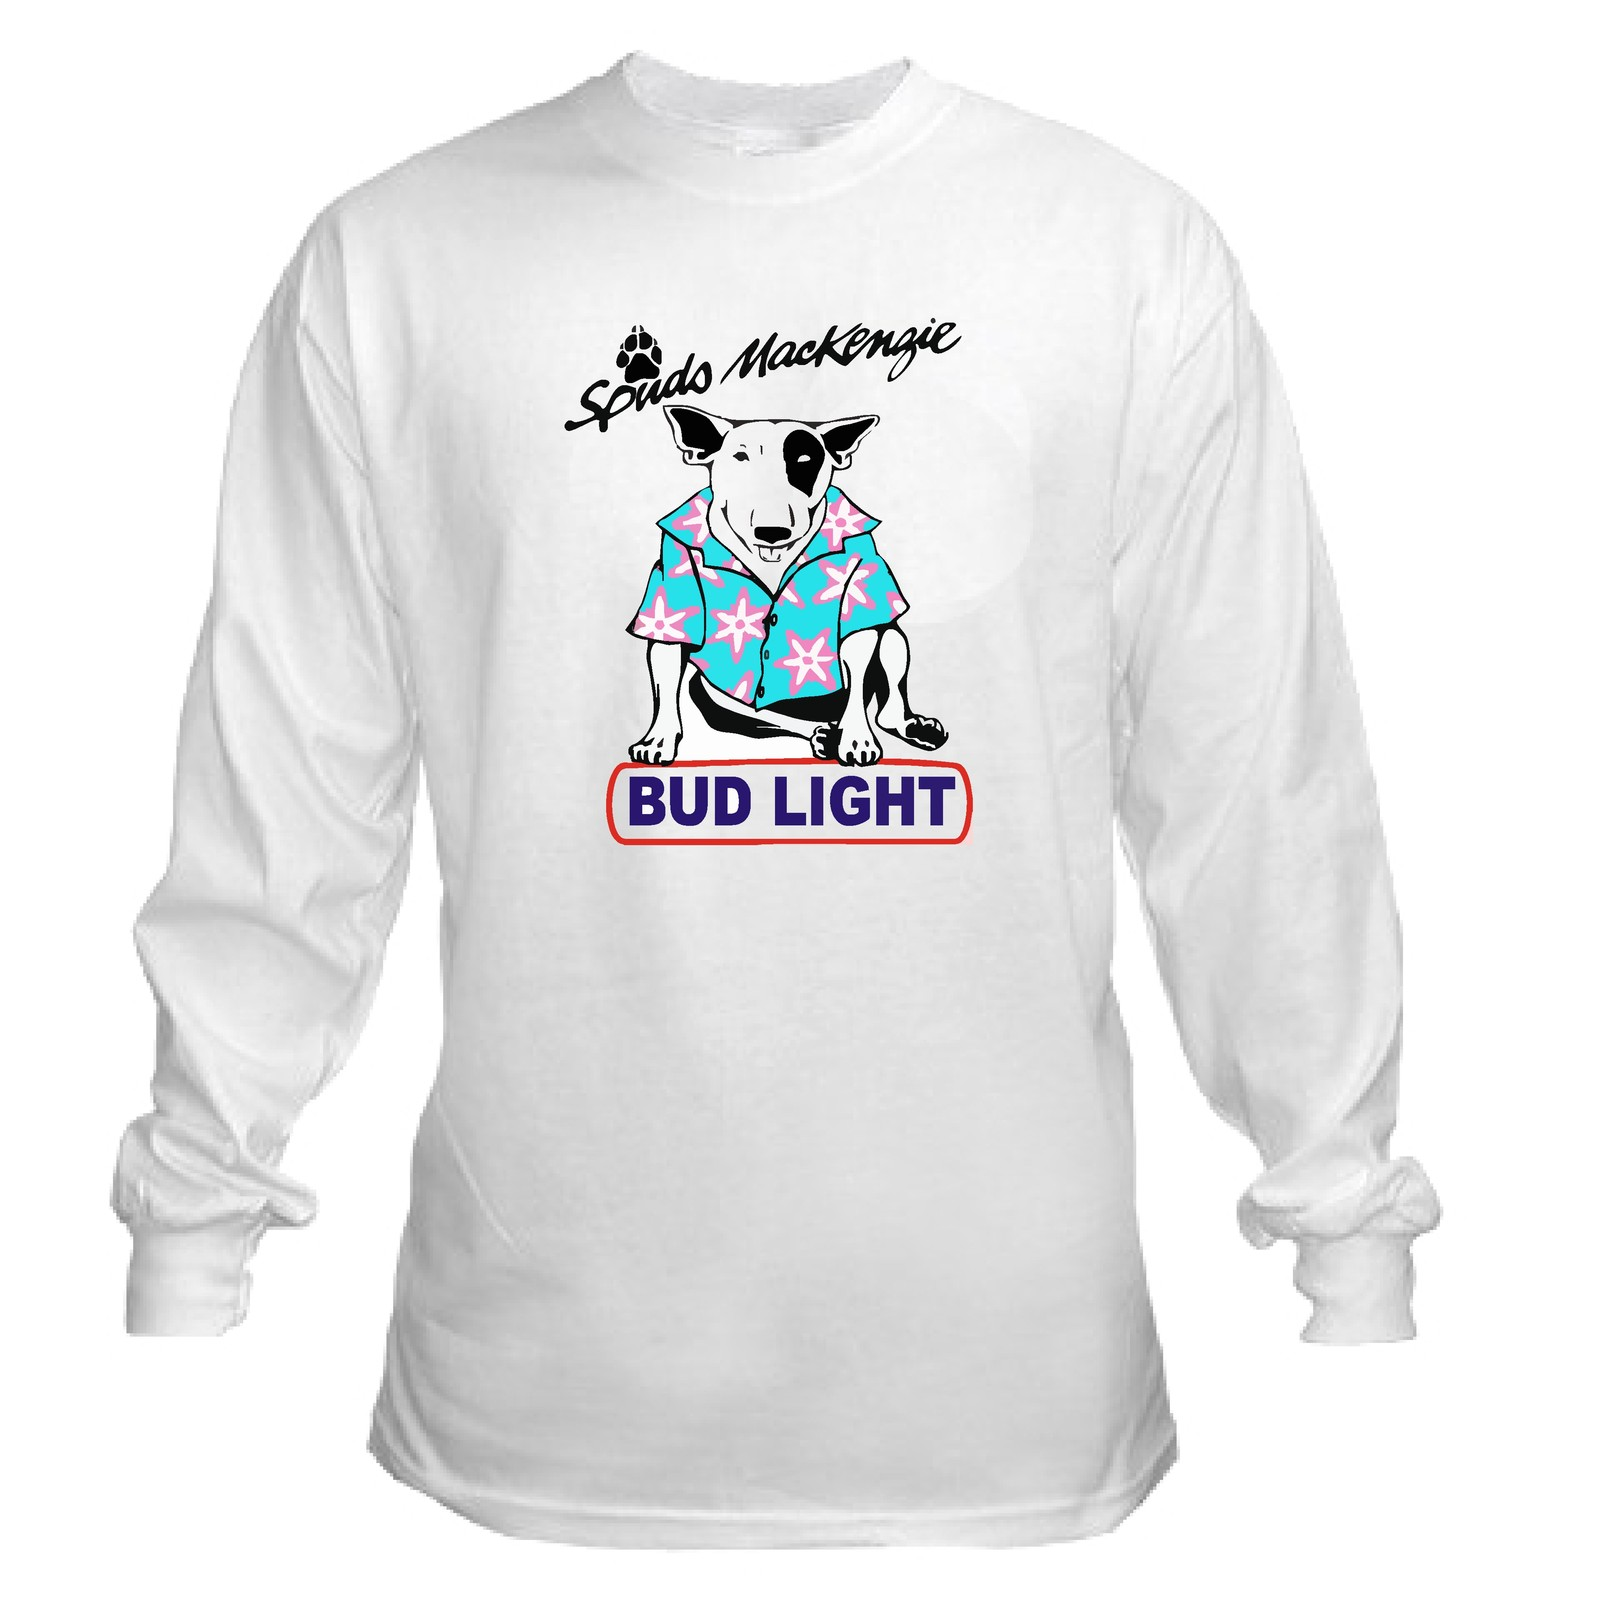 Bud_light_spuds_t_shirt_ls